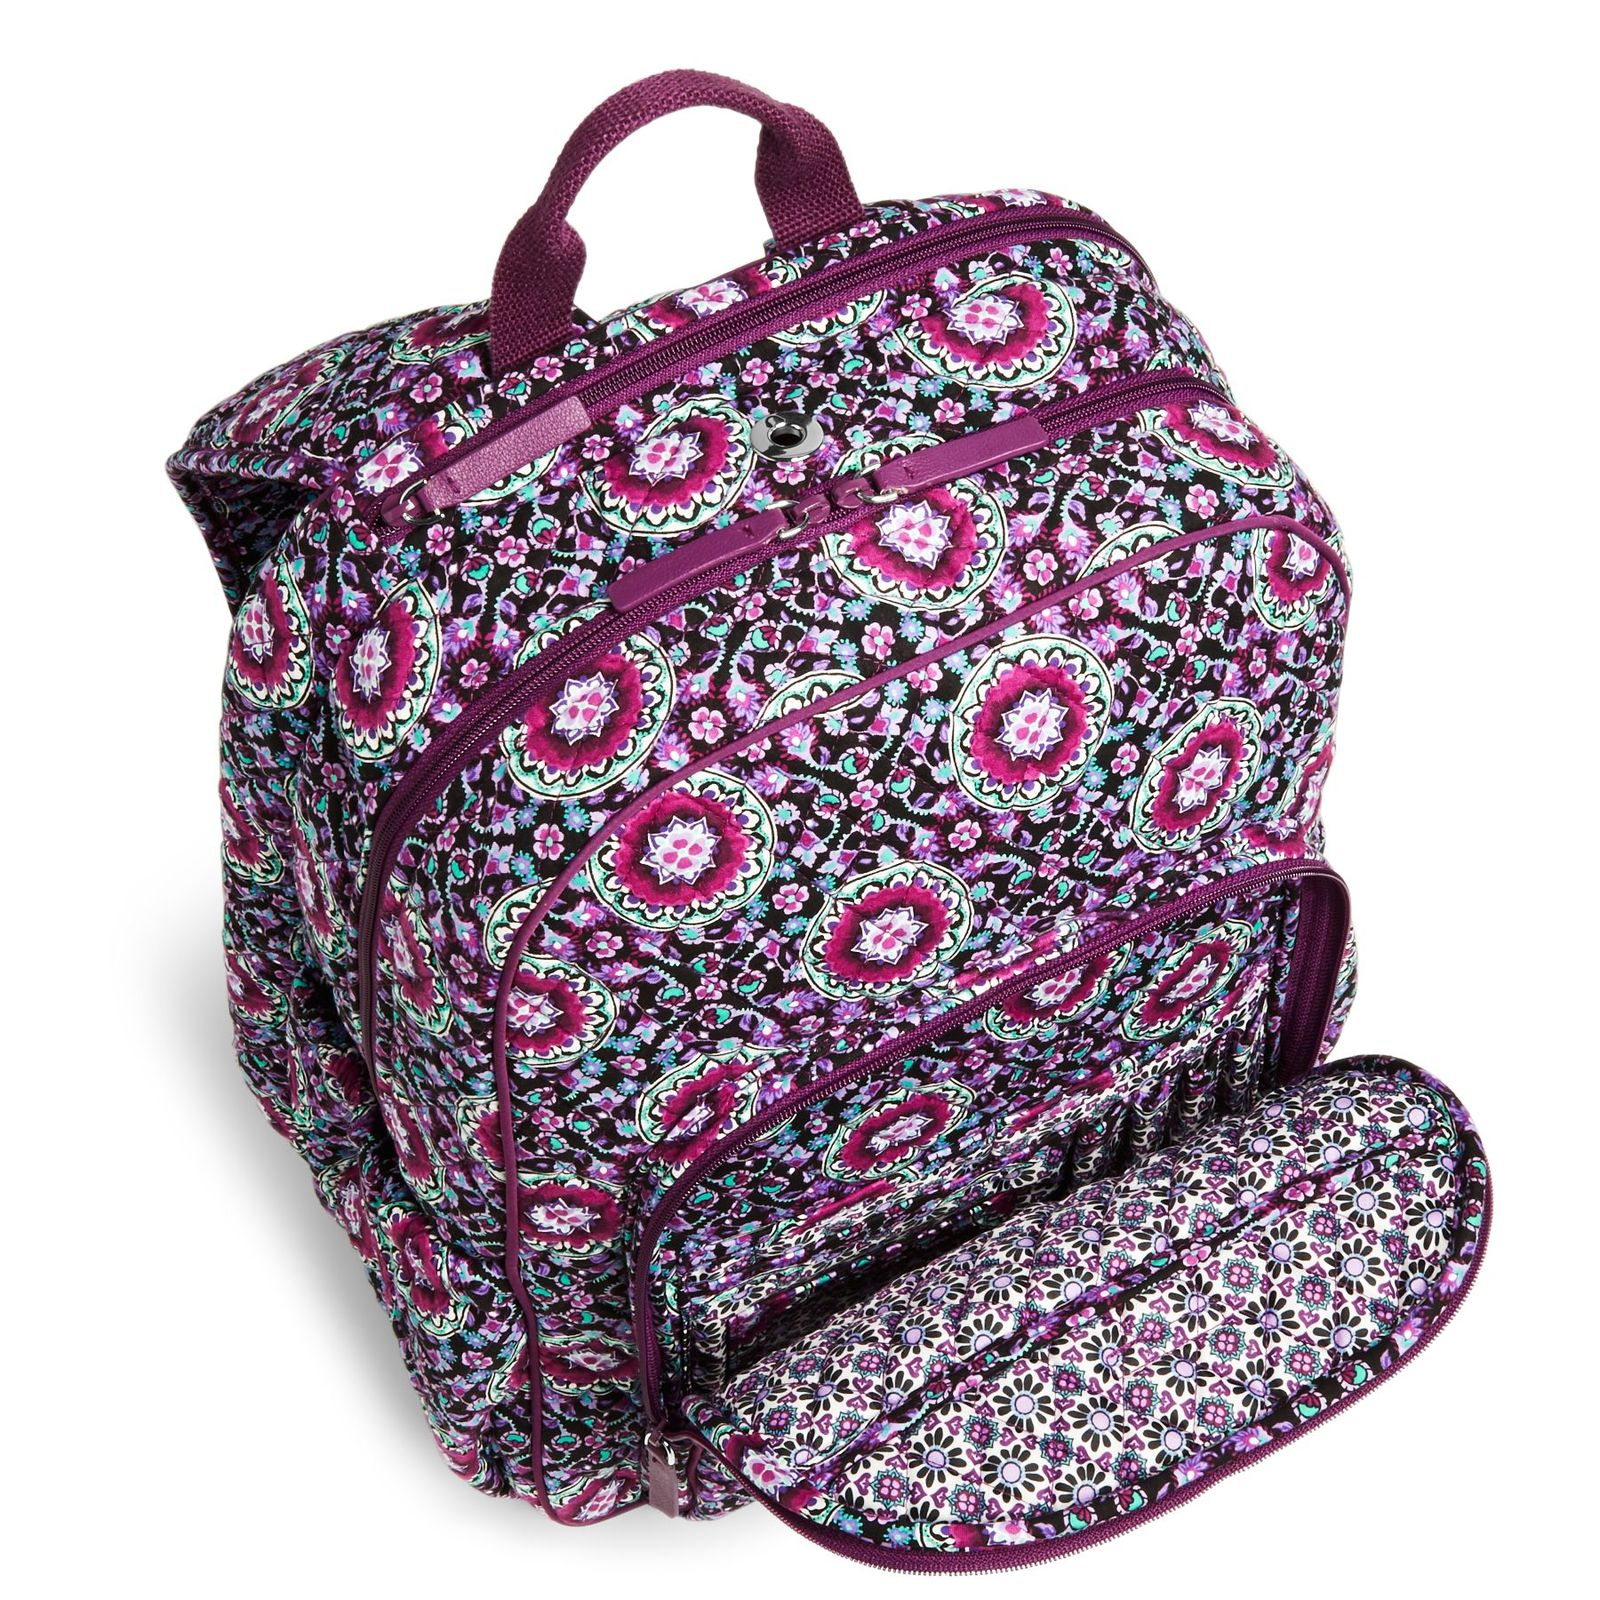 Vera Bradley Signature Cotton Campus Tech Backpack, Lilac Medallion image 4